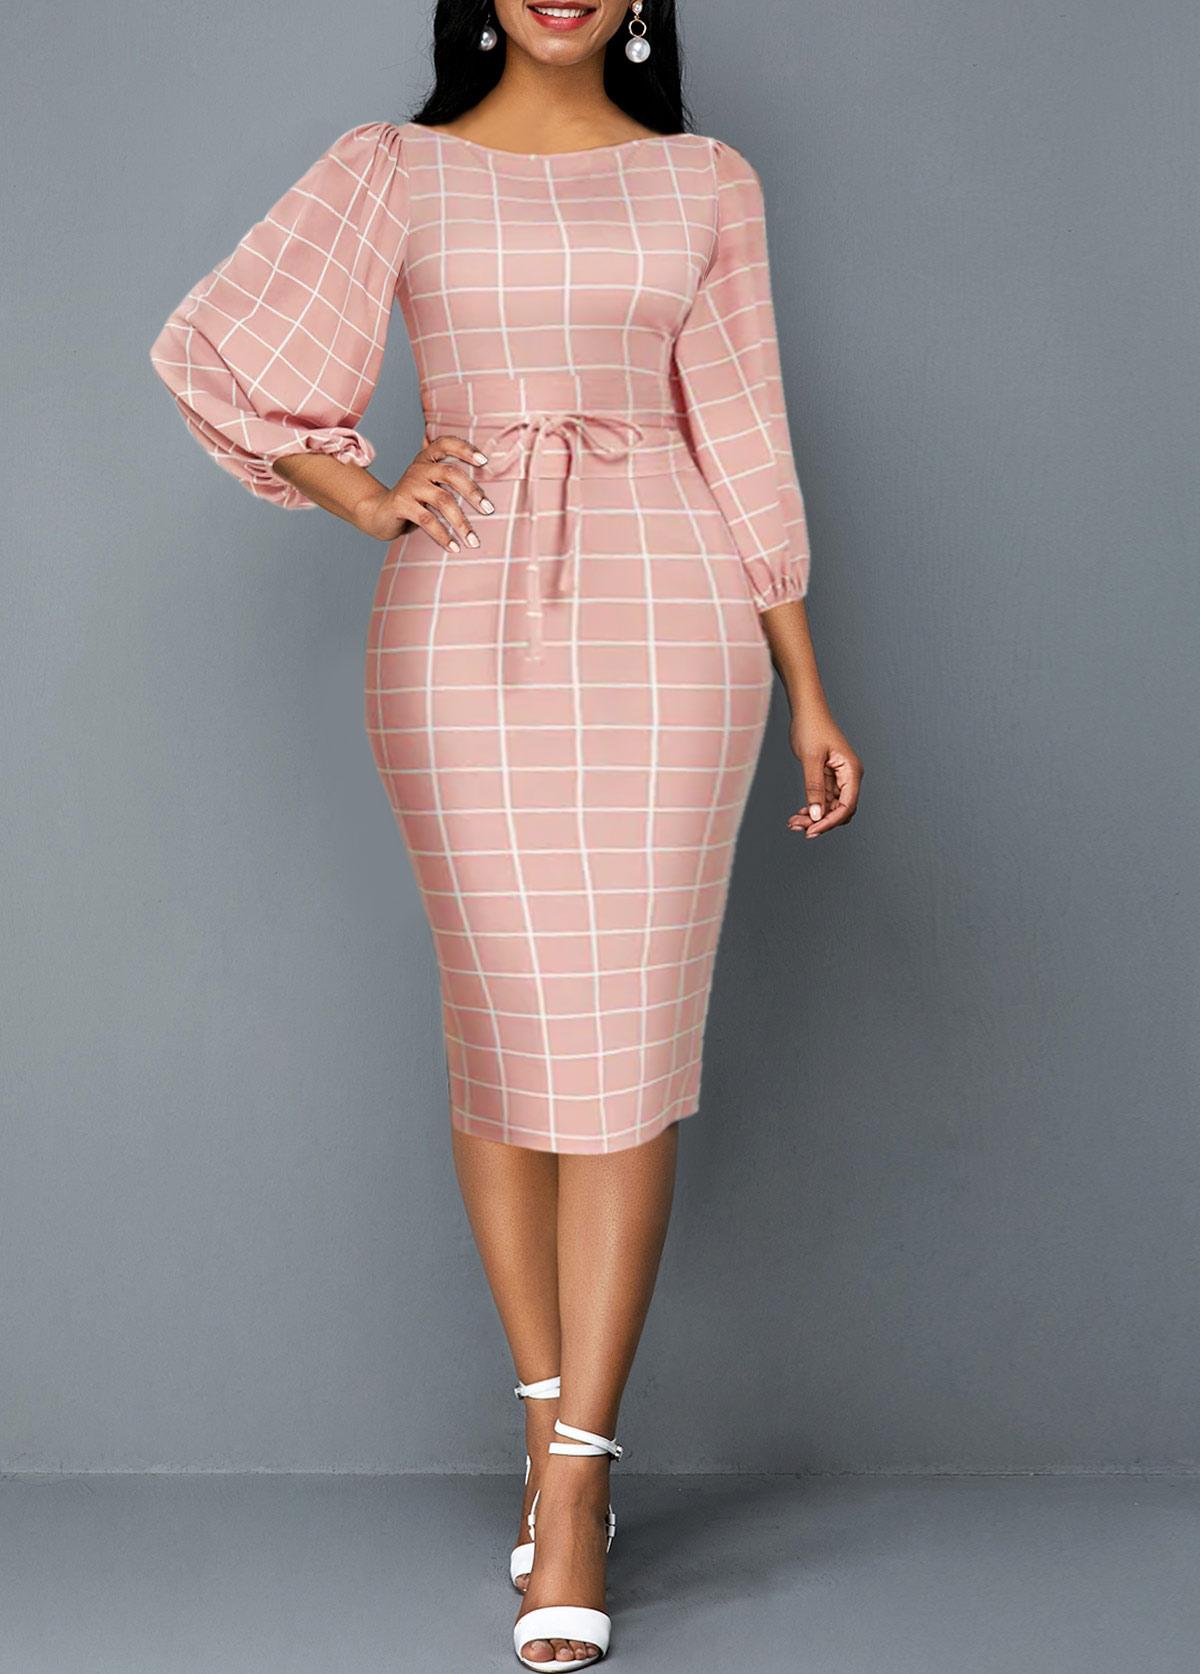 Plaid Print Lantern Sleeve Tie Front Sheath Dress